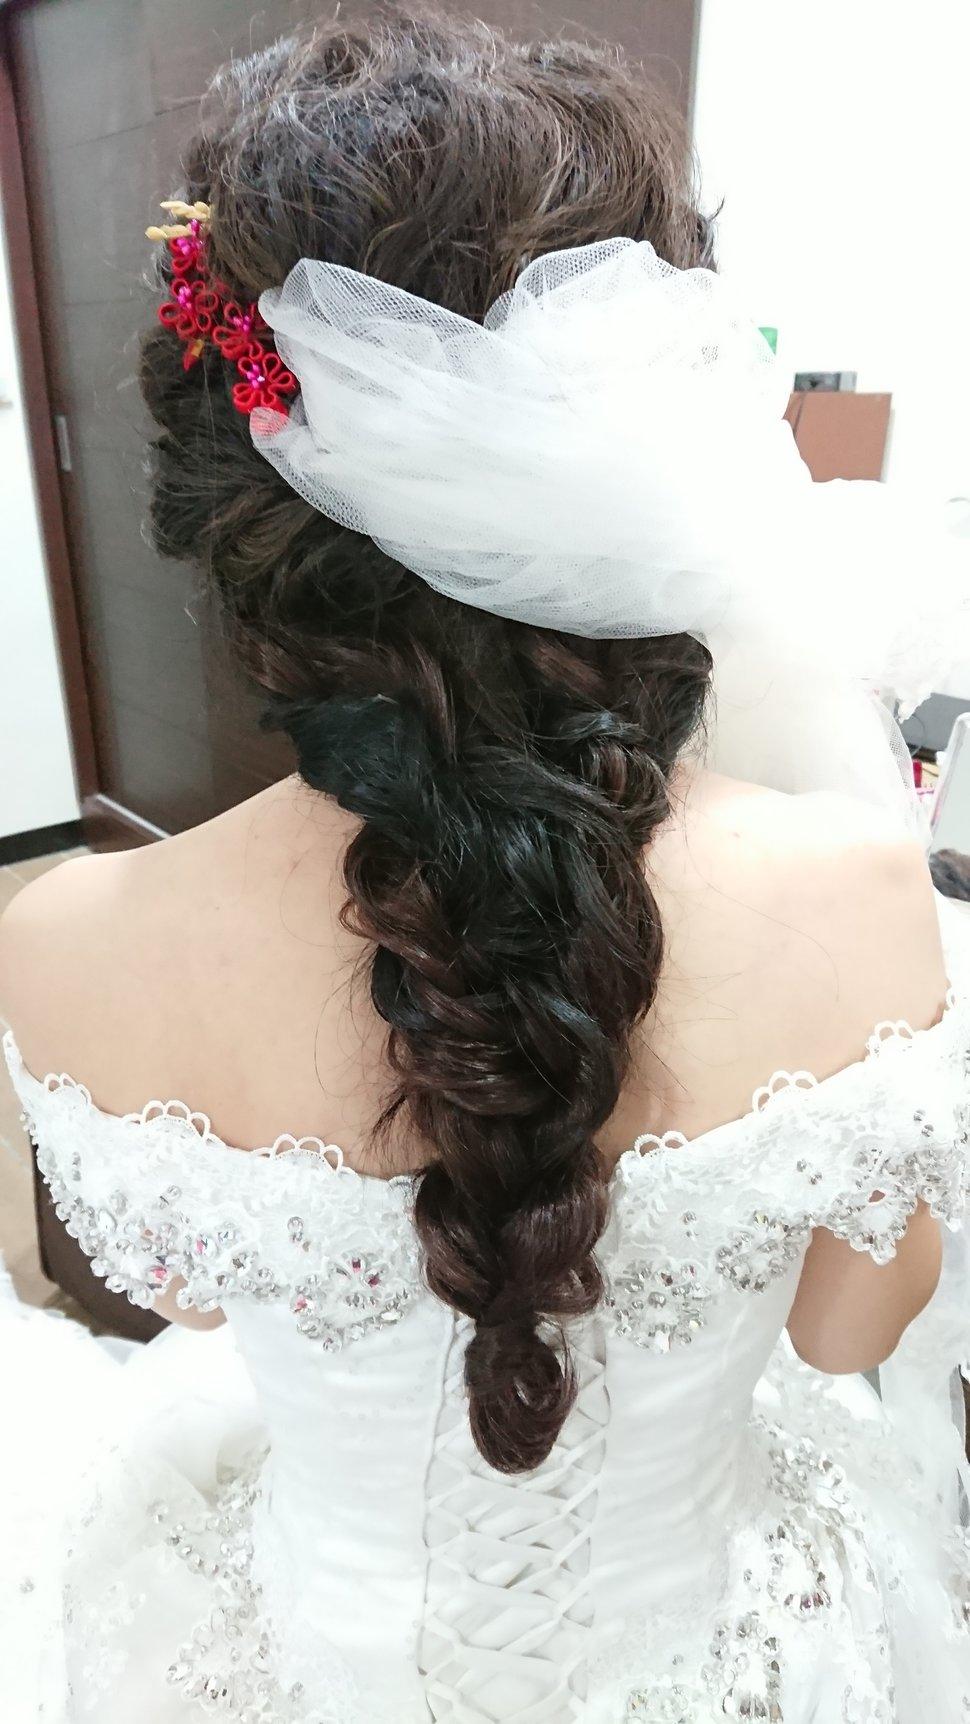 DSC_0370 - 花精靈婚紗∣攝影∣新秘 - 結婚吧